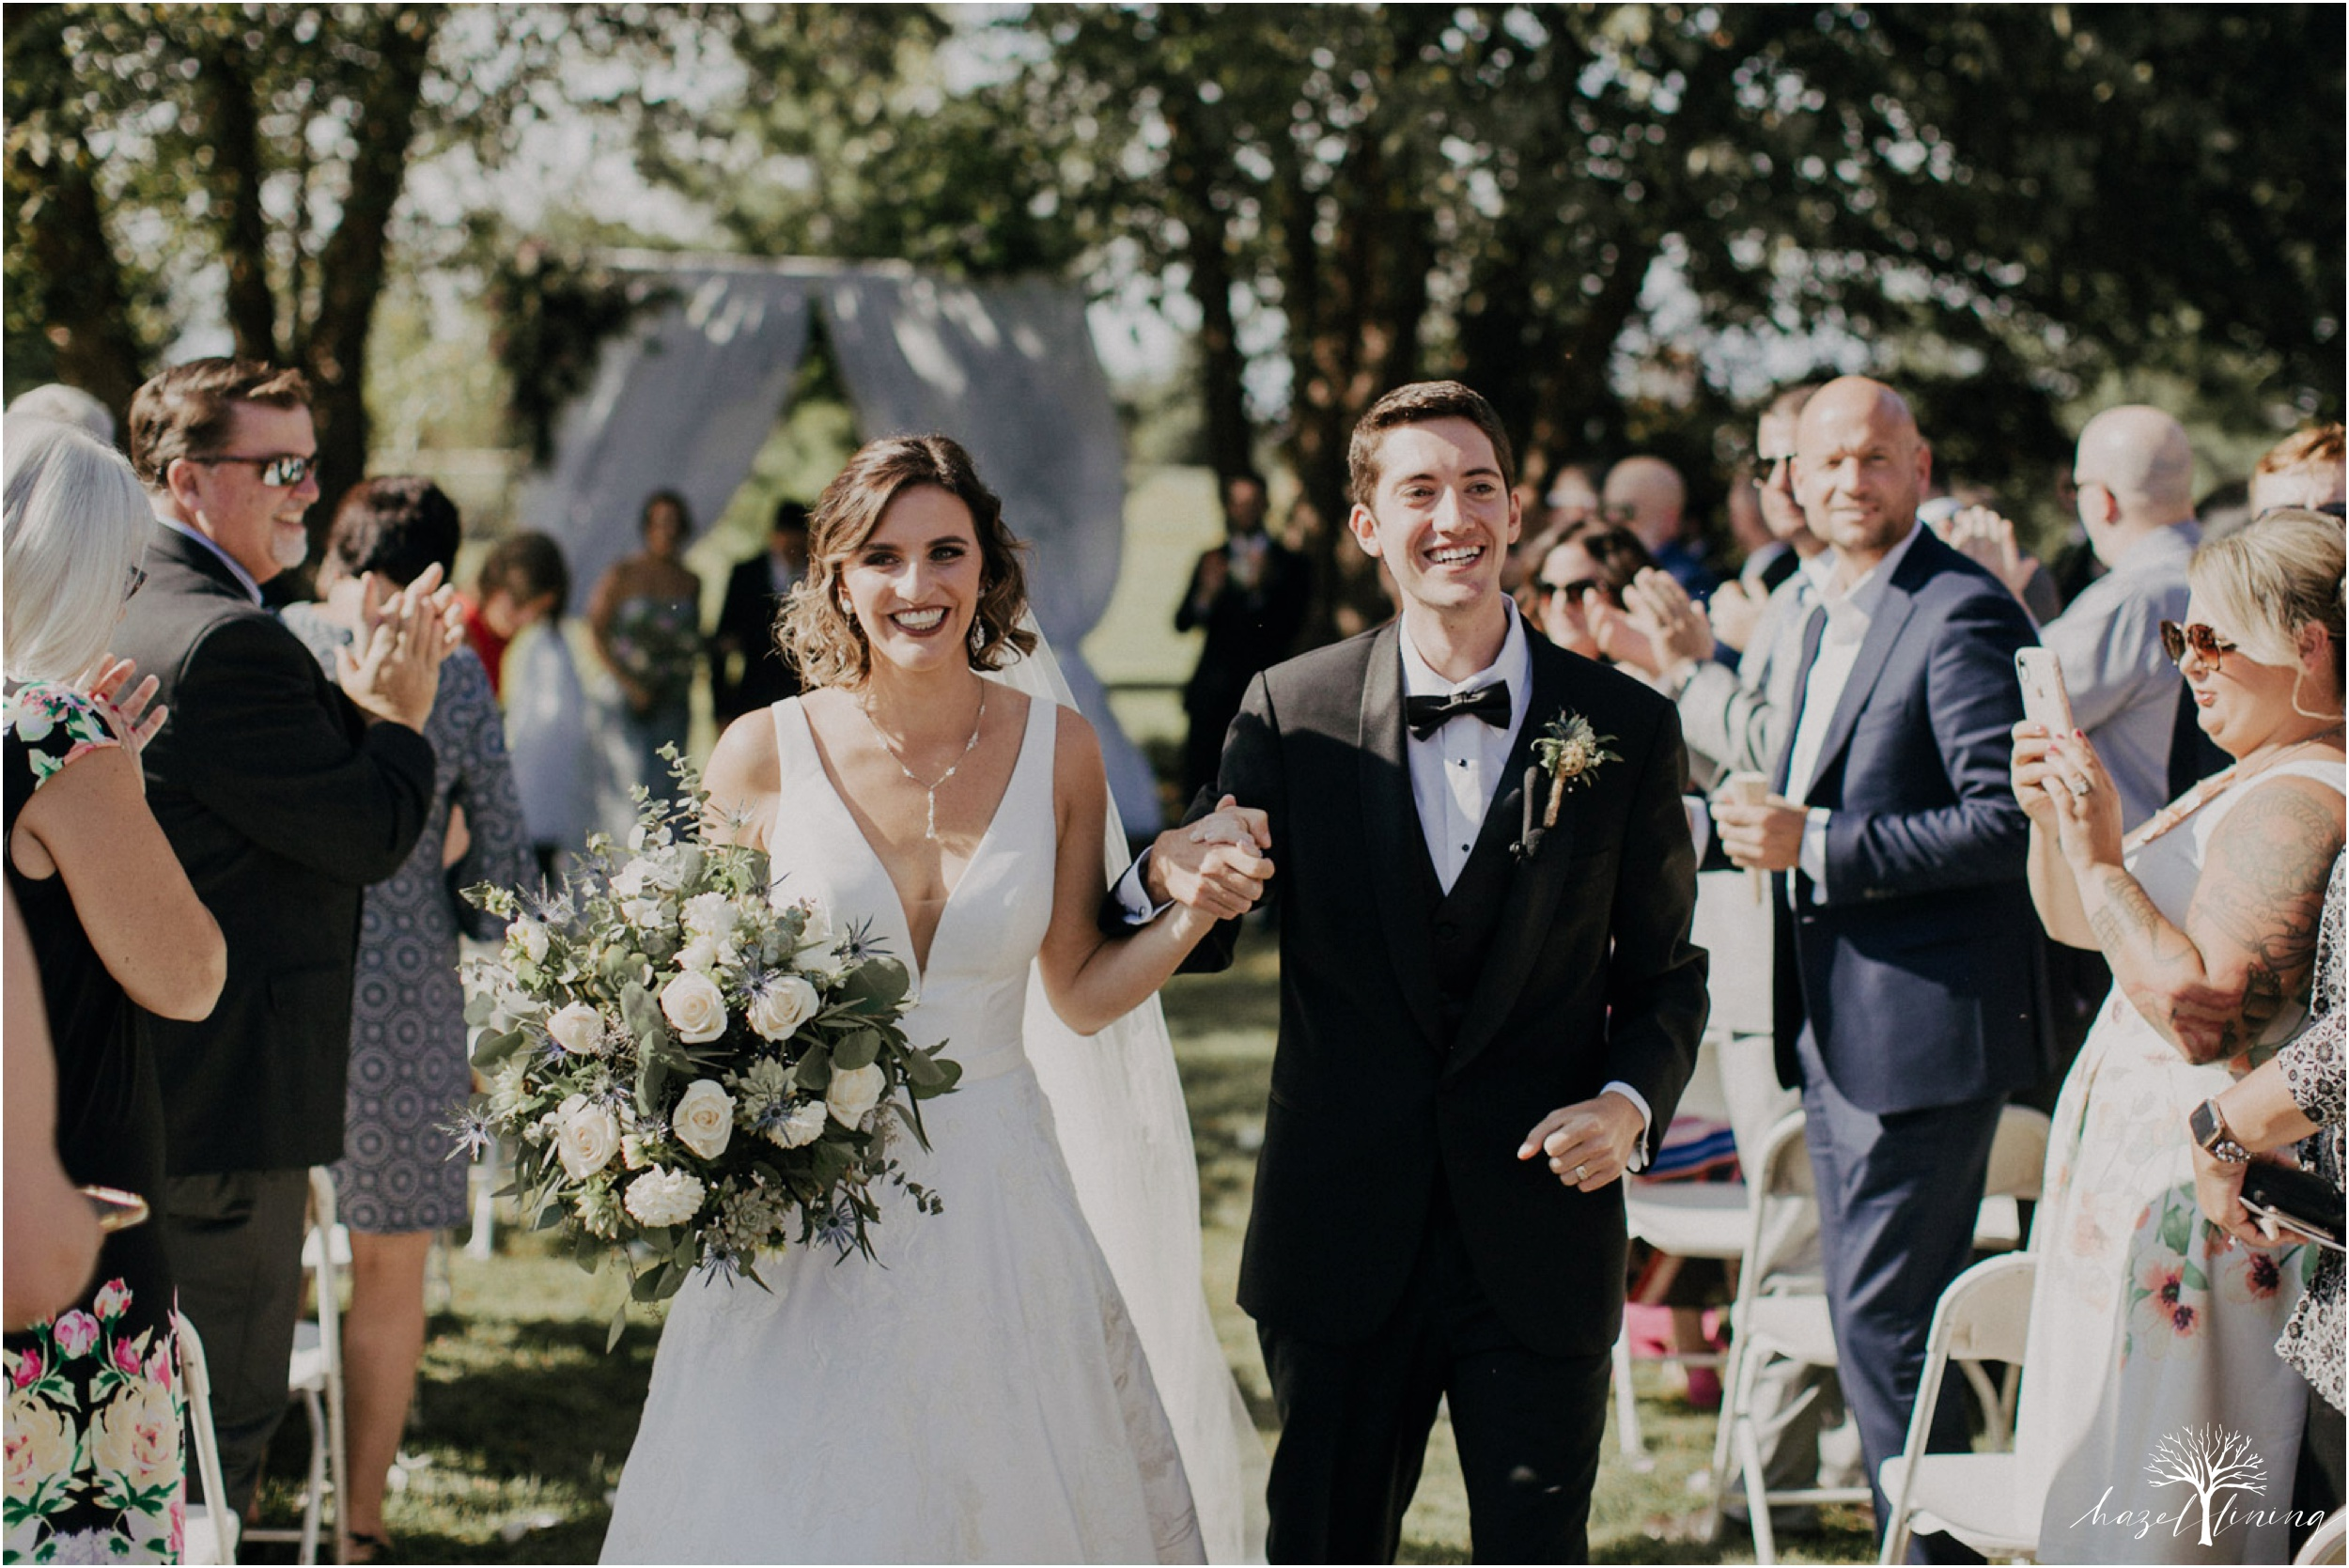 maureen-hepner-anthony-giordano-rose-bank-winery-newtow-pennsylvania-luxury-summer-wedding-hazel-lining-photography-destination-elopement-wedding-engagement-photography_0077.jpg